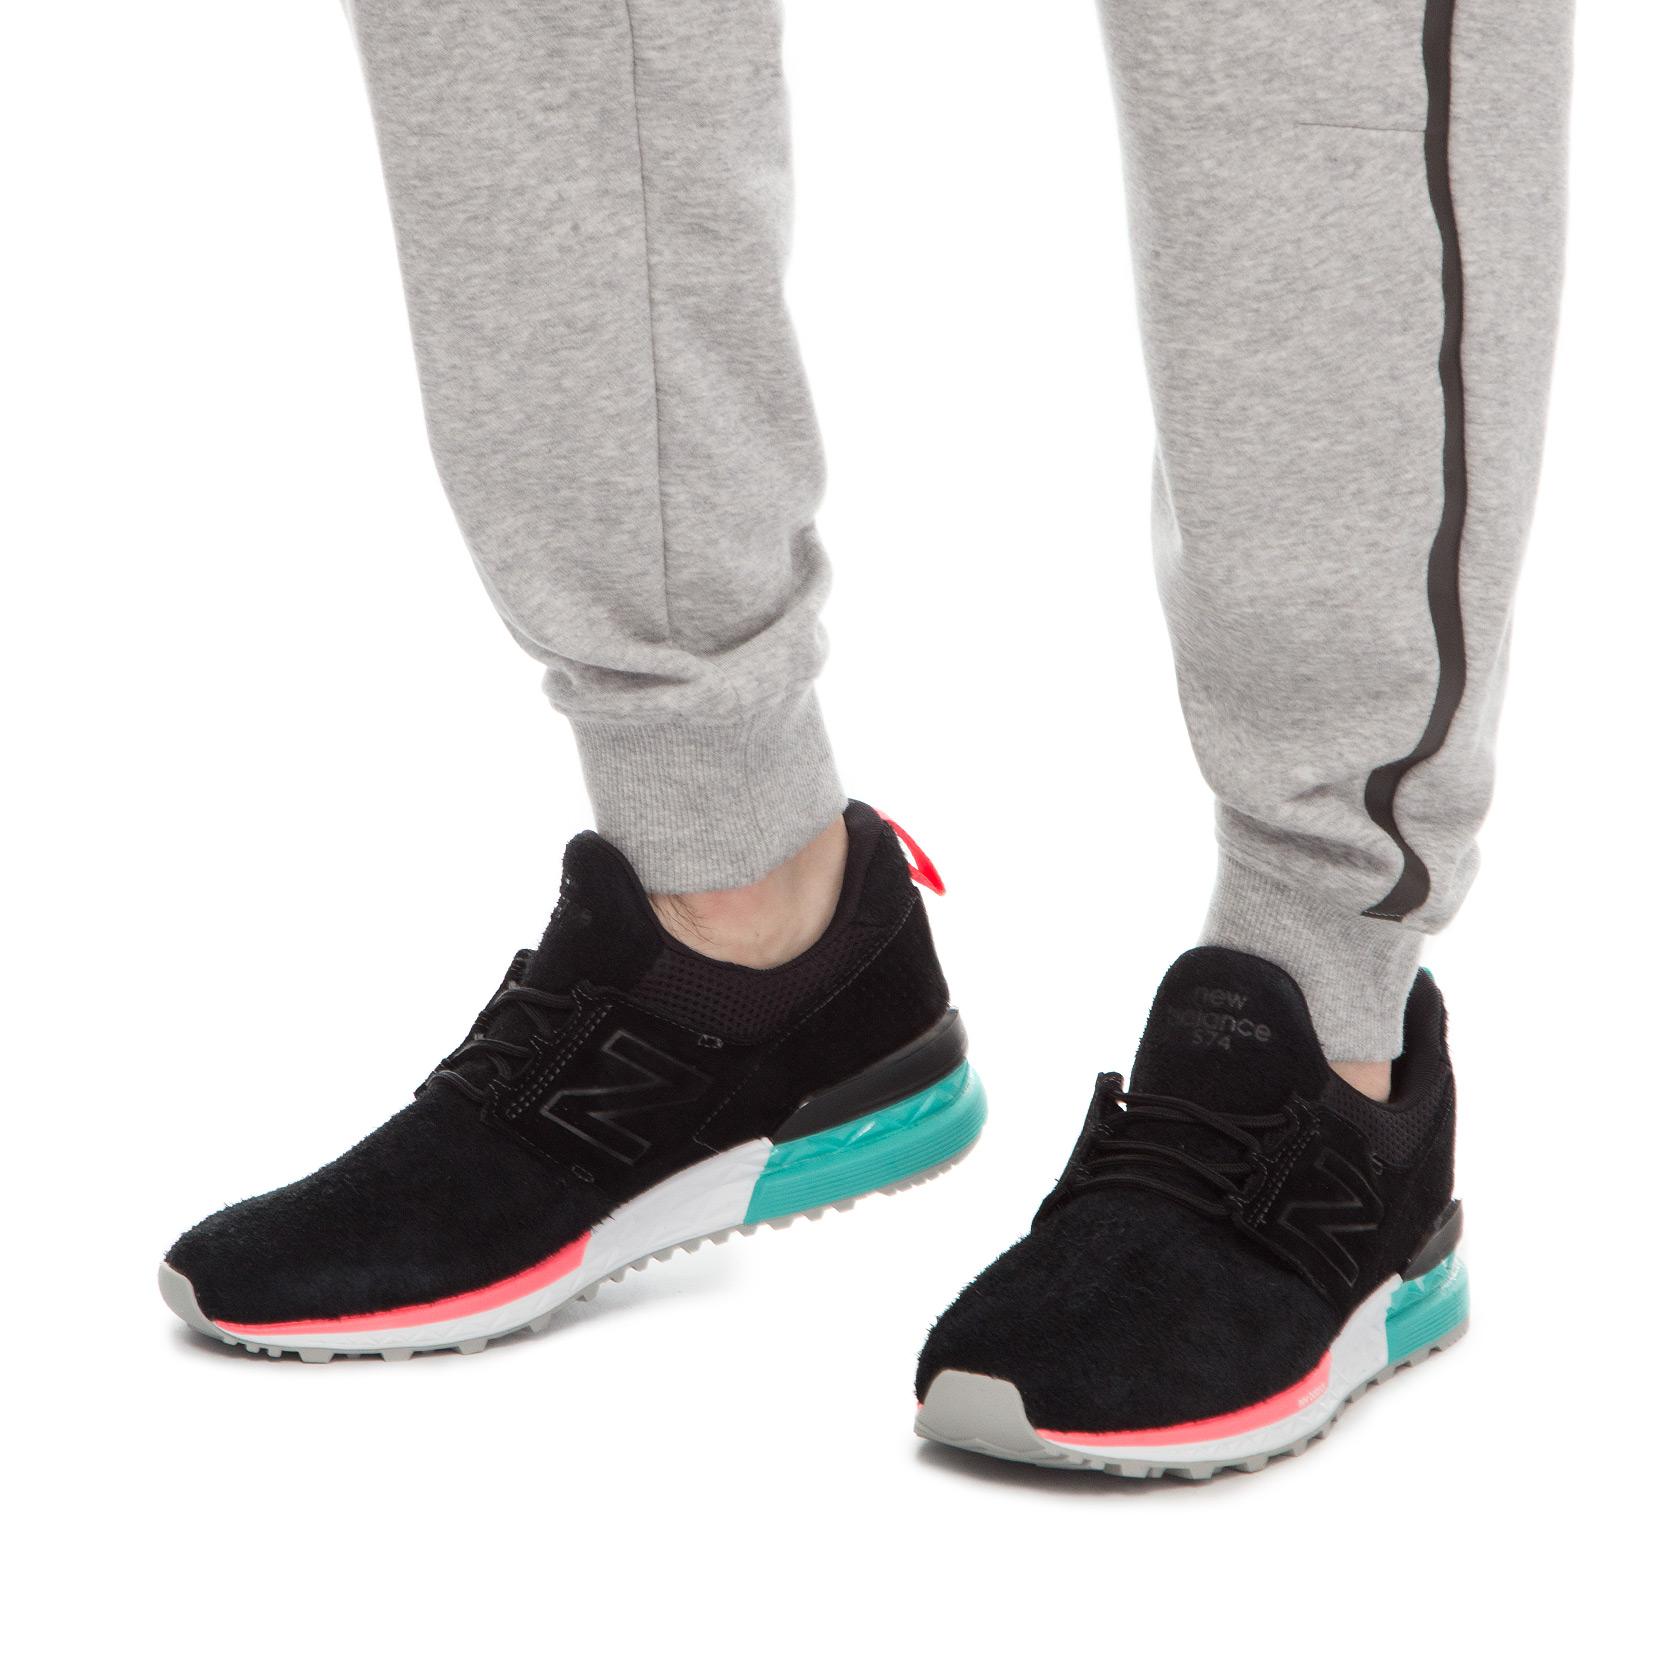 on sale 1a1ec 92ee0 Чоловіче взуття повсякденне New Balance 574 Sport MS574DOA ...